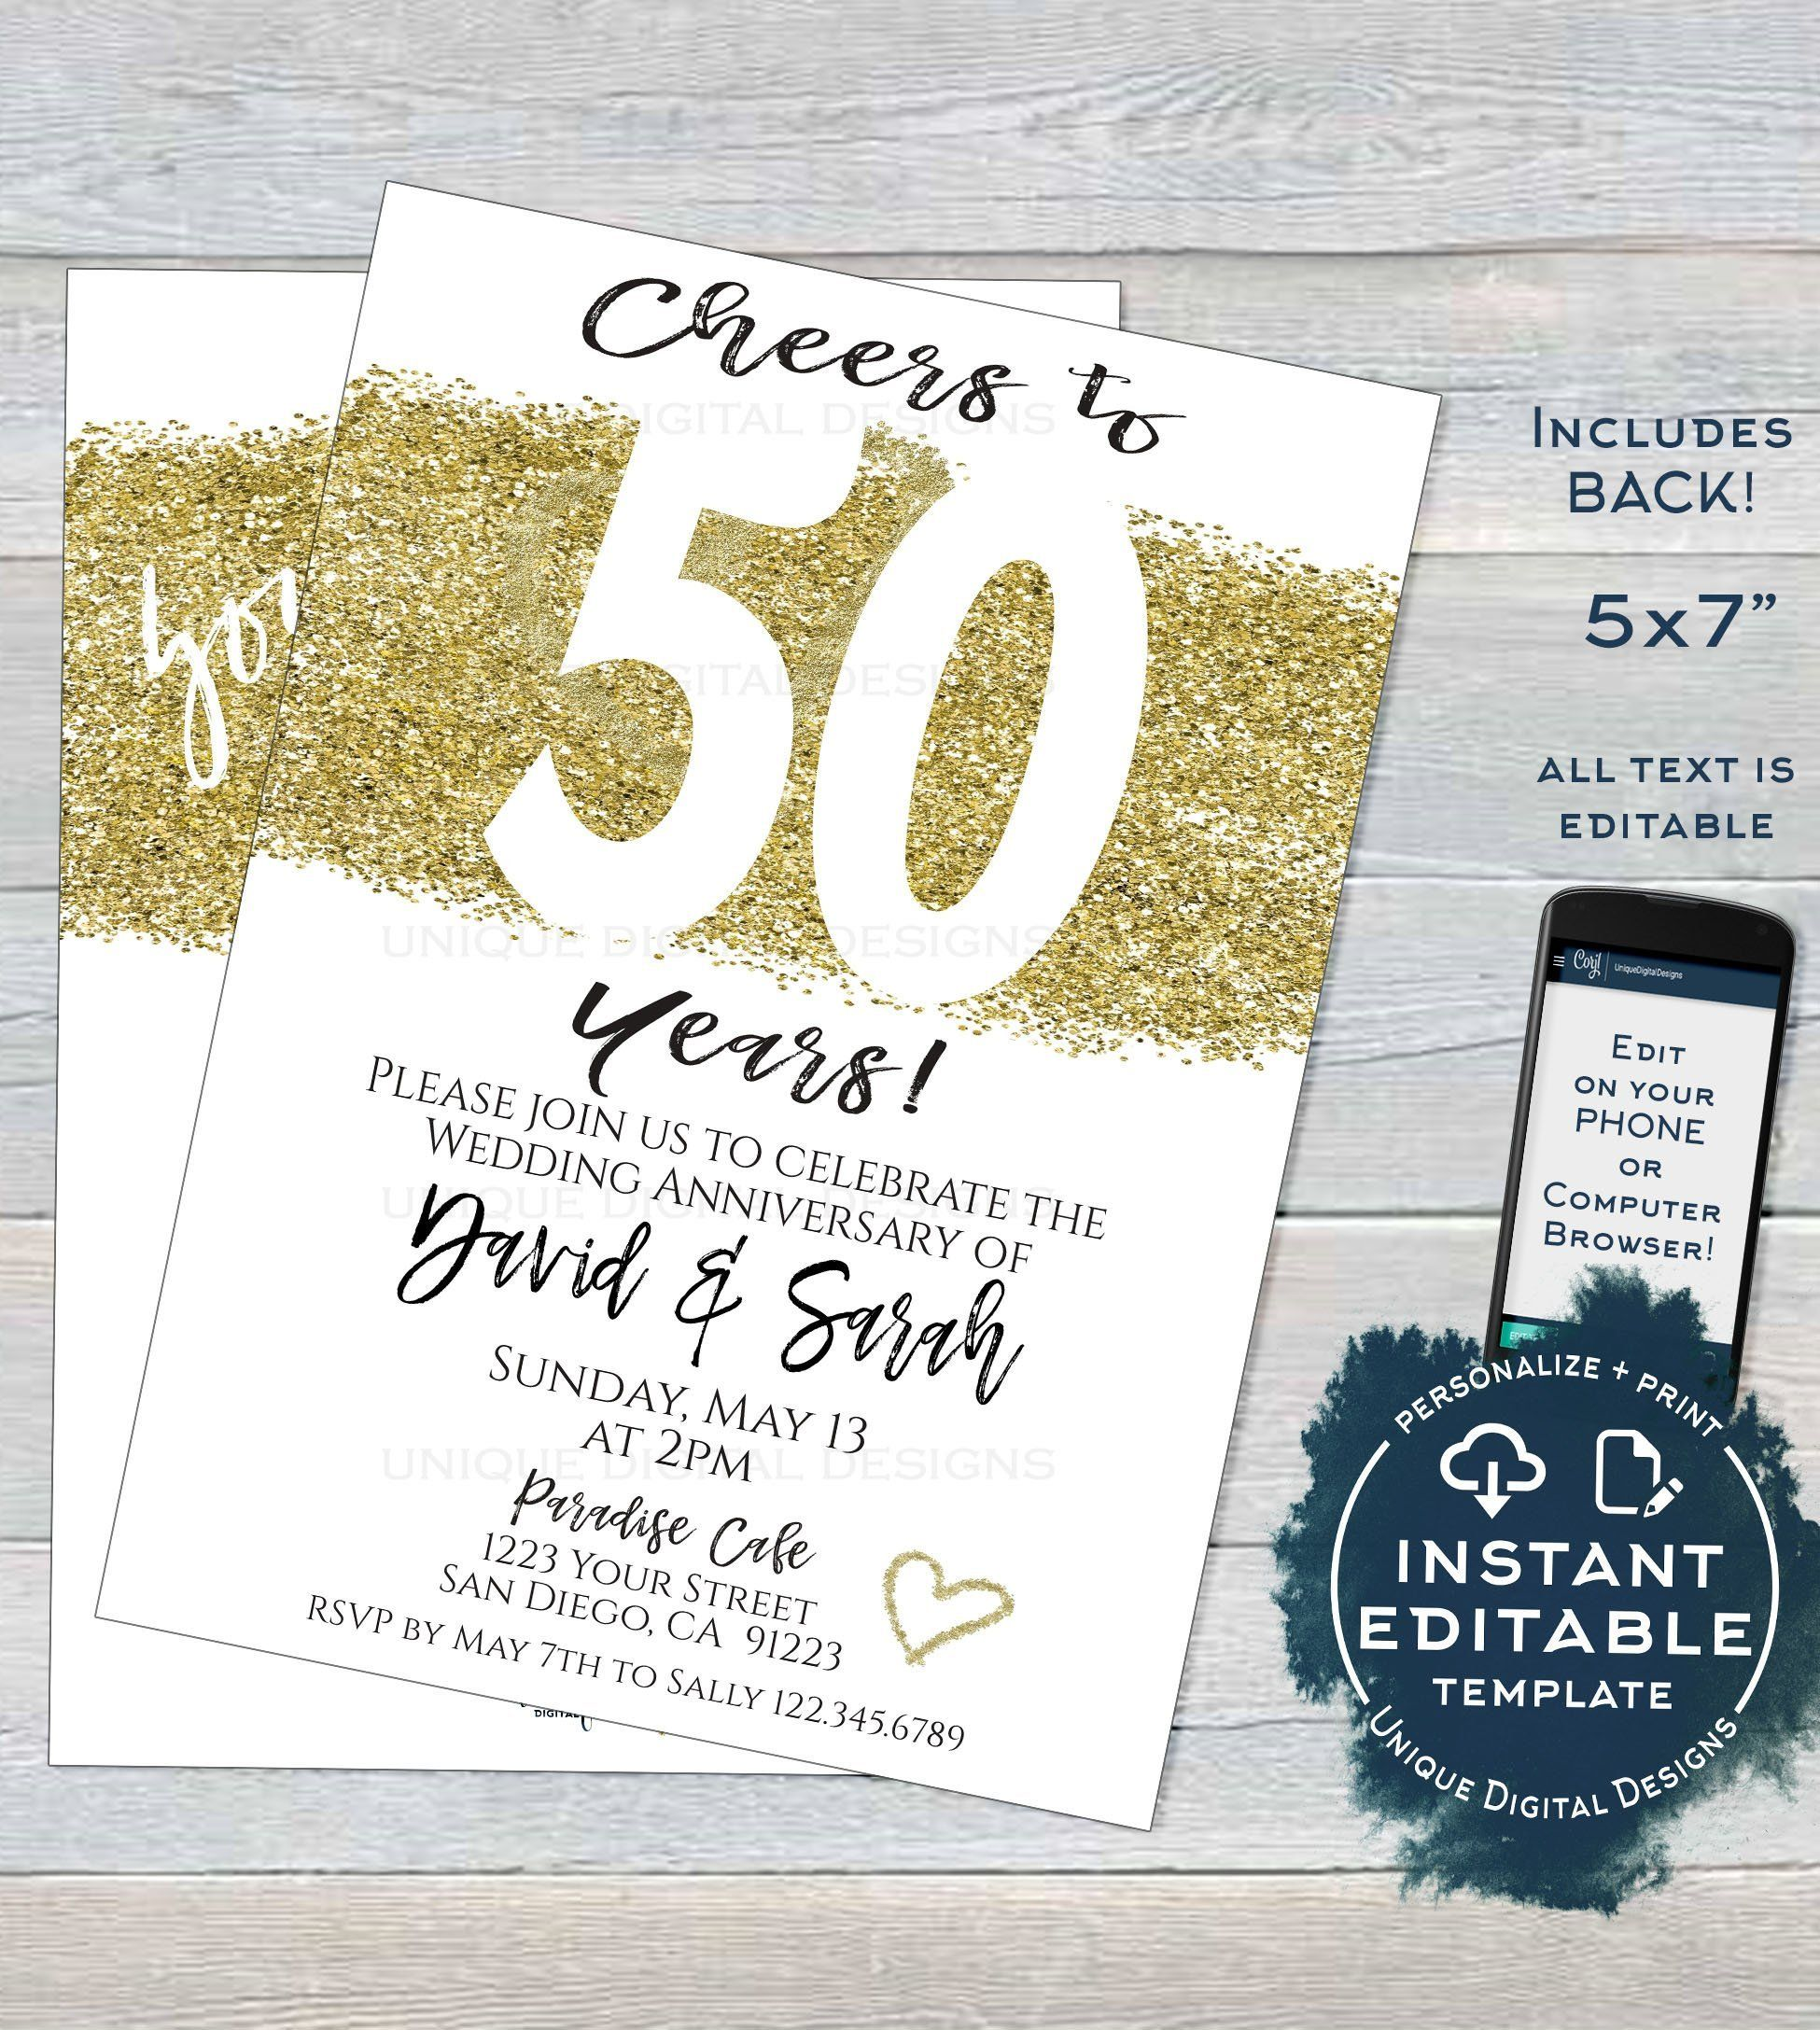 50 Year Anniversary Invitation Fiftieth Golden Wedding Anniversary 50th Surprise Party Invite Custom Printable In 2020 50th Wedding Anniversary Invitations 50th Anniversary Invitations Anniversary Invitations